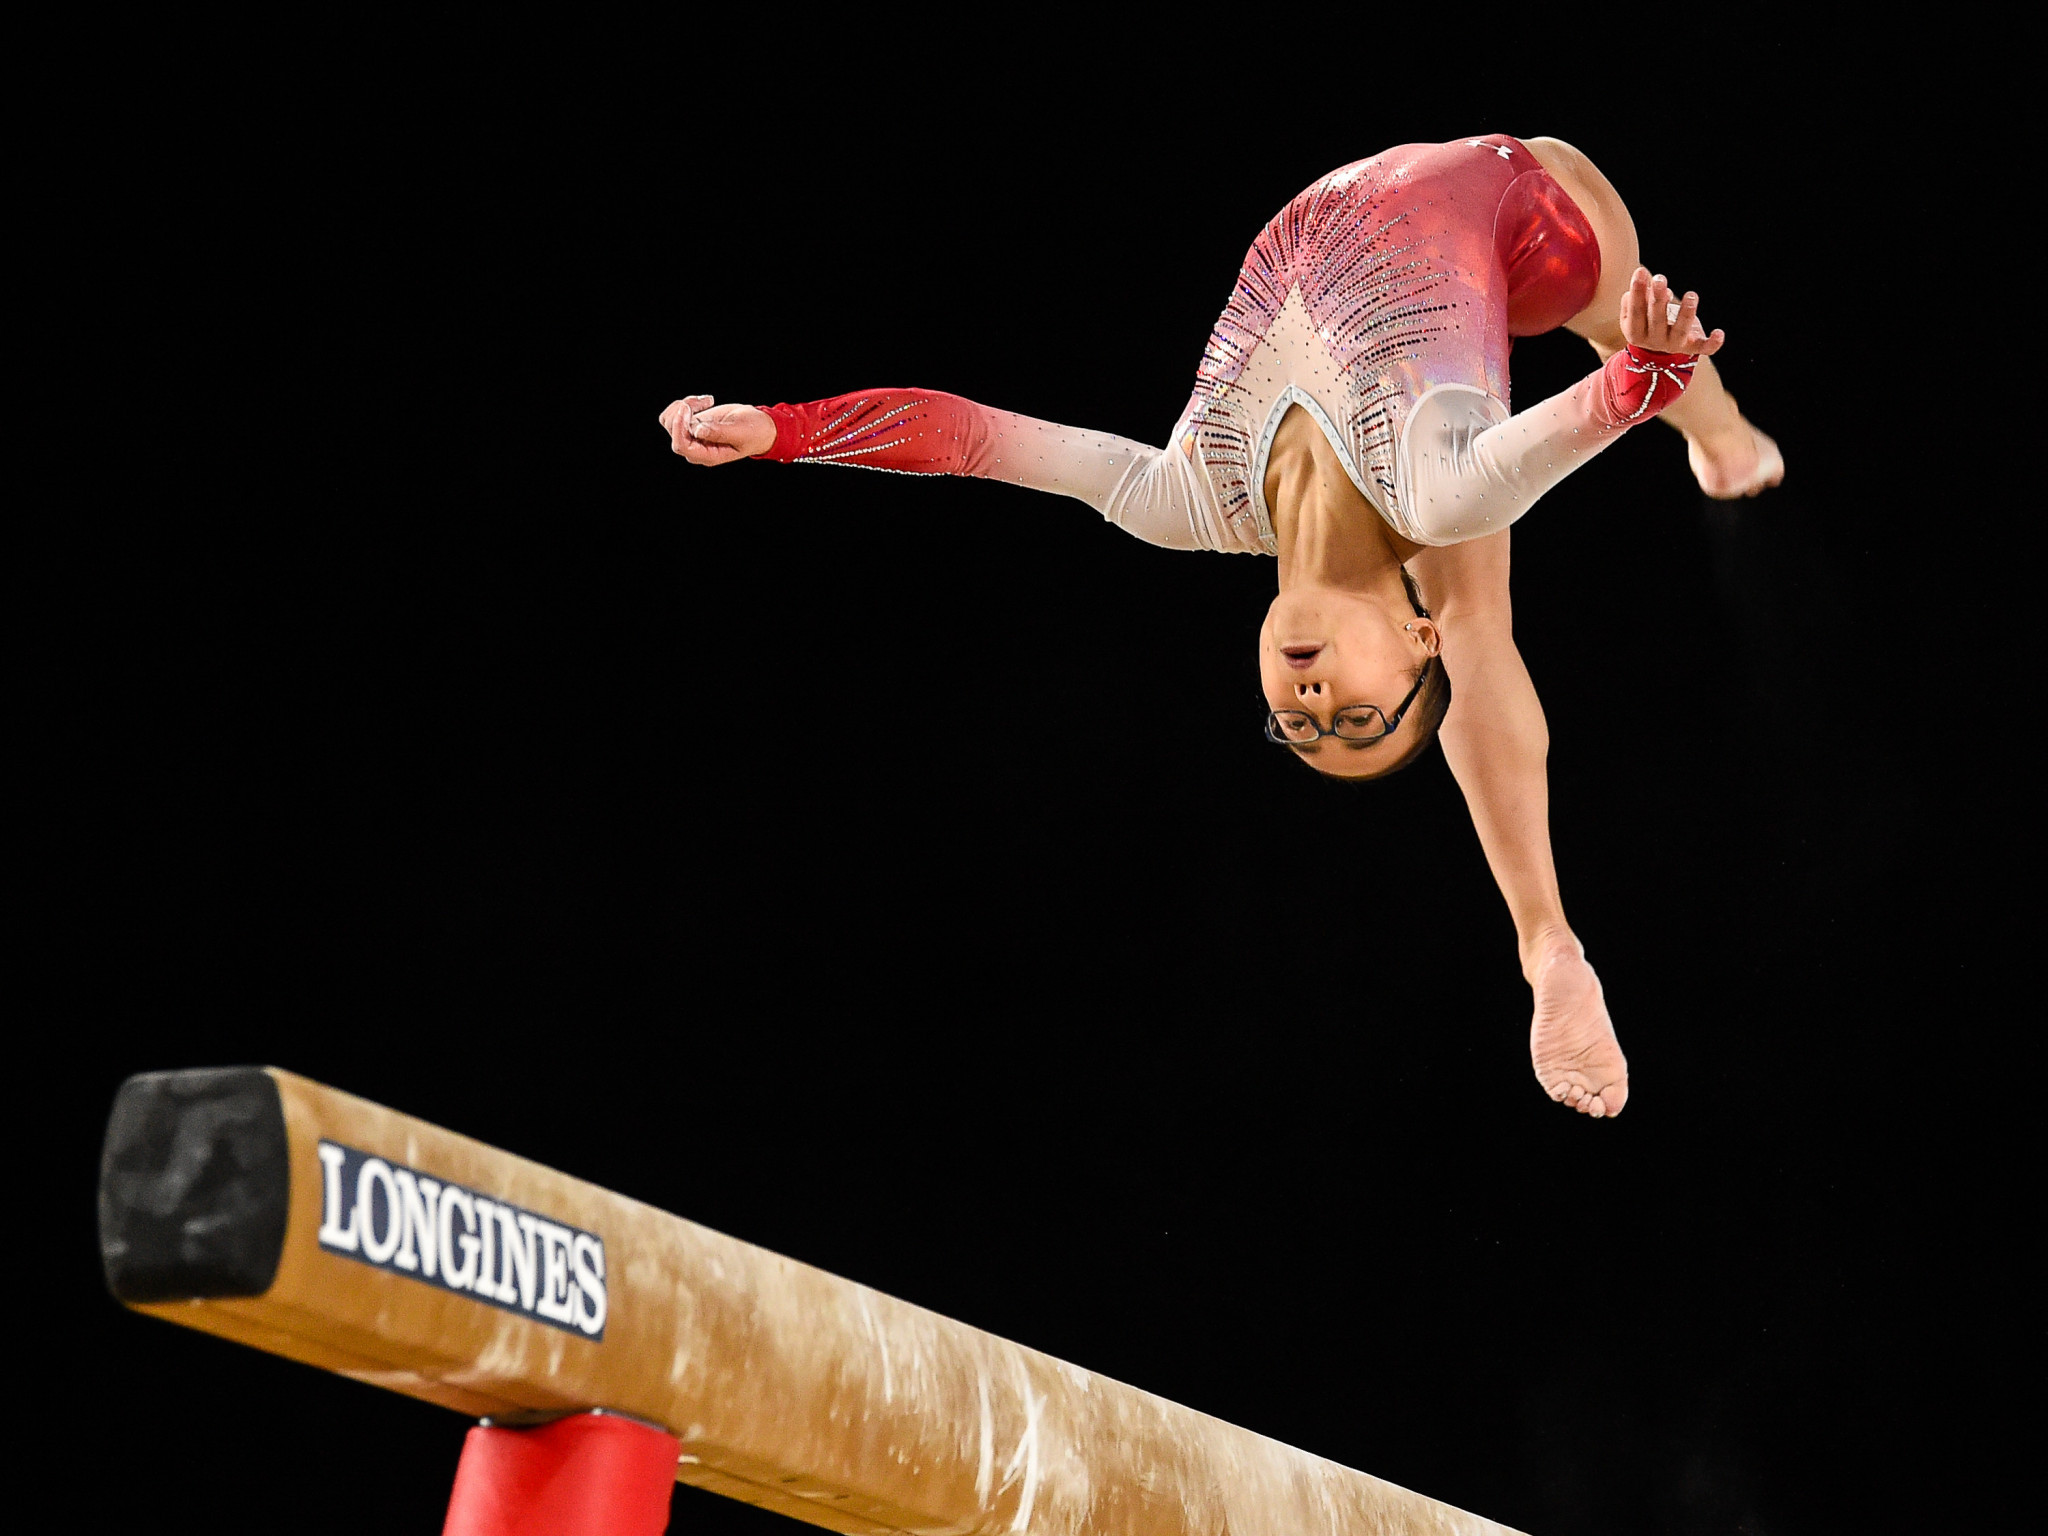 Gymnast Hurd among USOC Best of October award winners